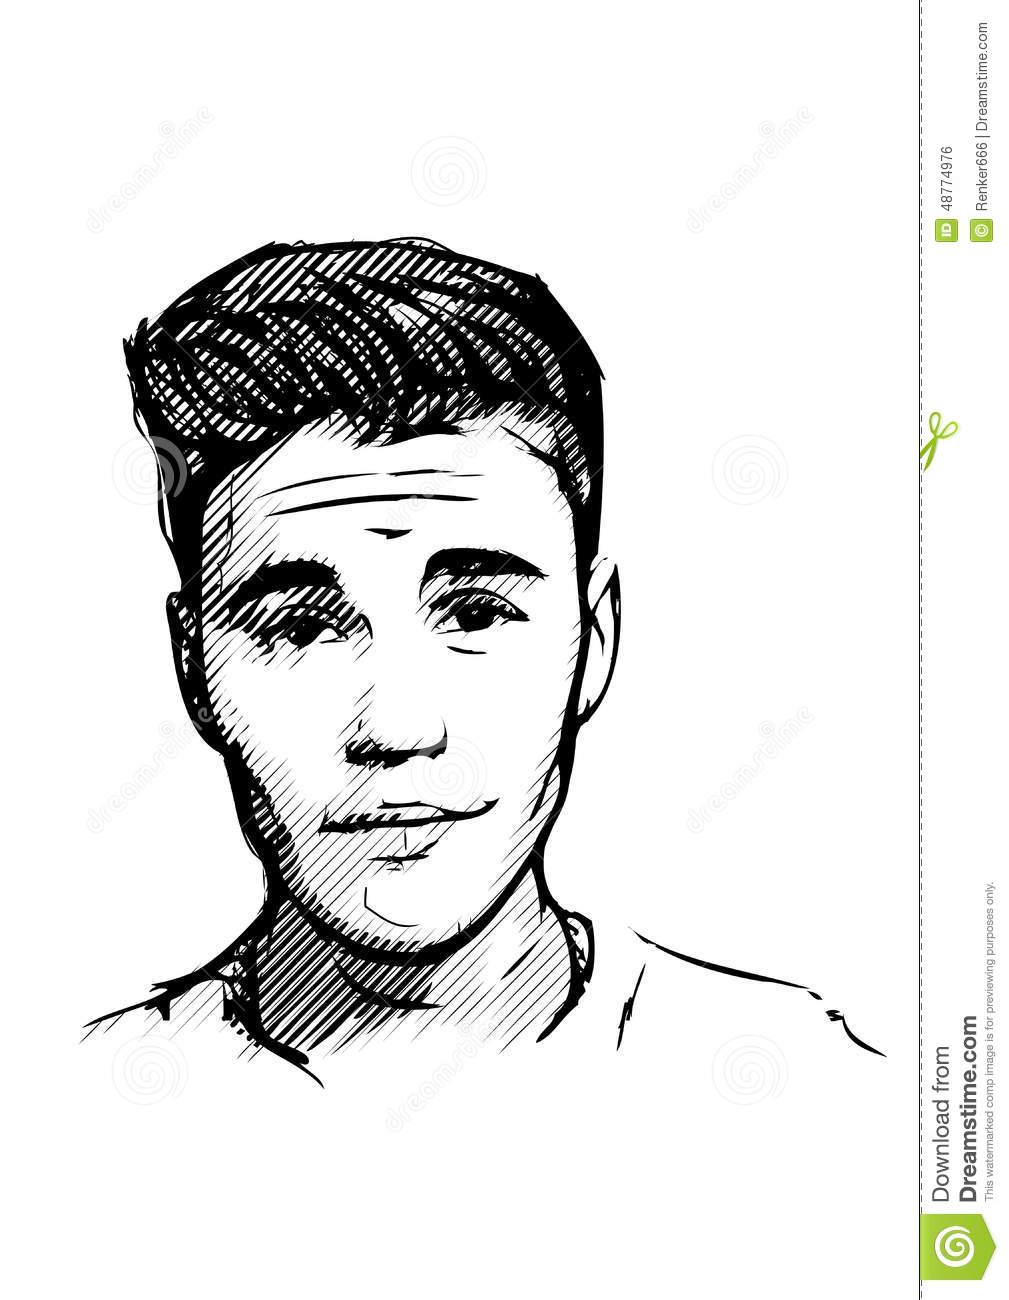 Justin bieber clipart image freeuse 64+ Justin Bieber Clipart | ClipartLook image freeuse